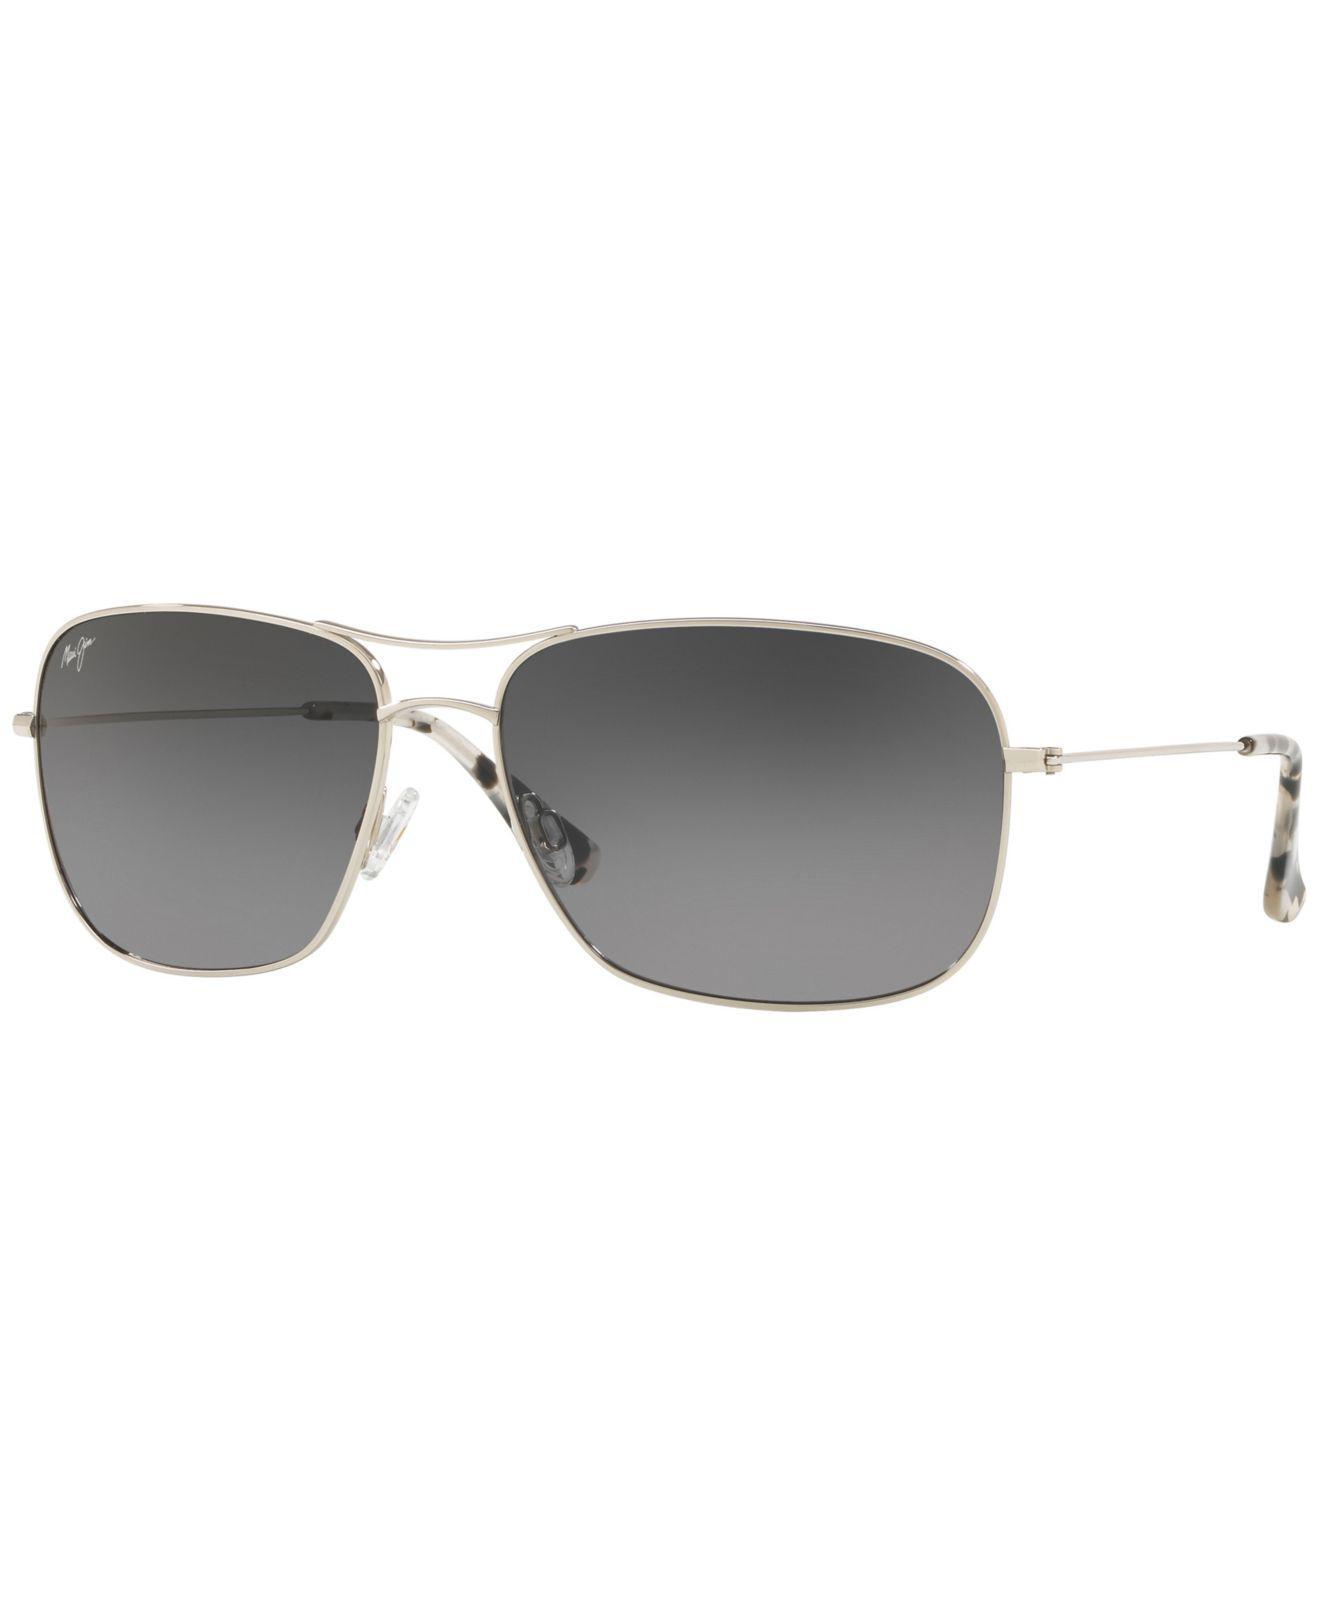 Maui Jim Breezeway Sonnenbrille Gold Gold 63mm aekFpgB